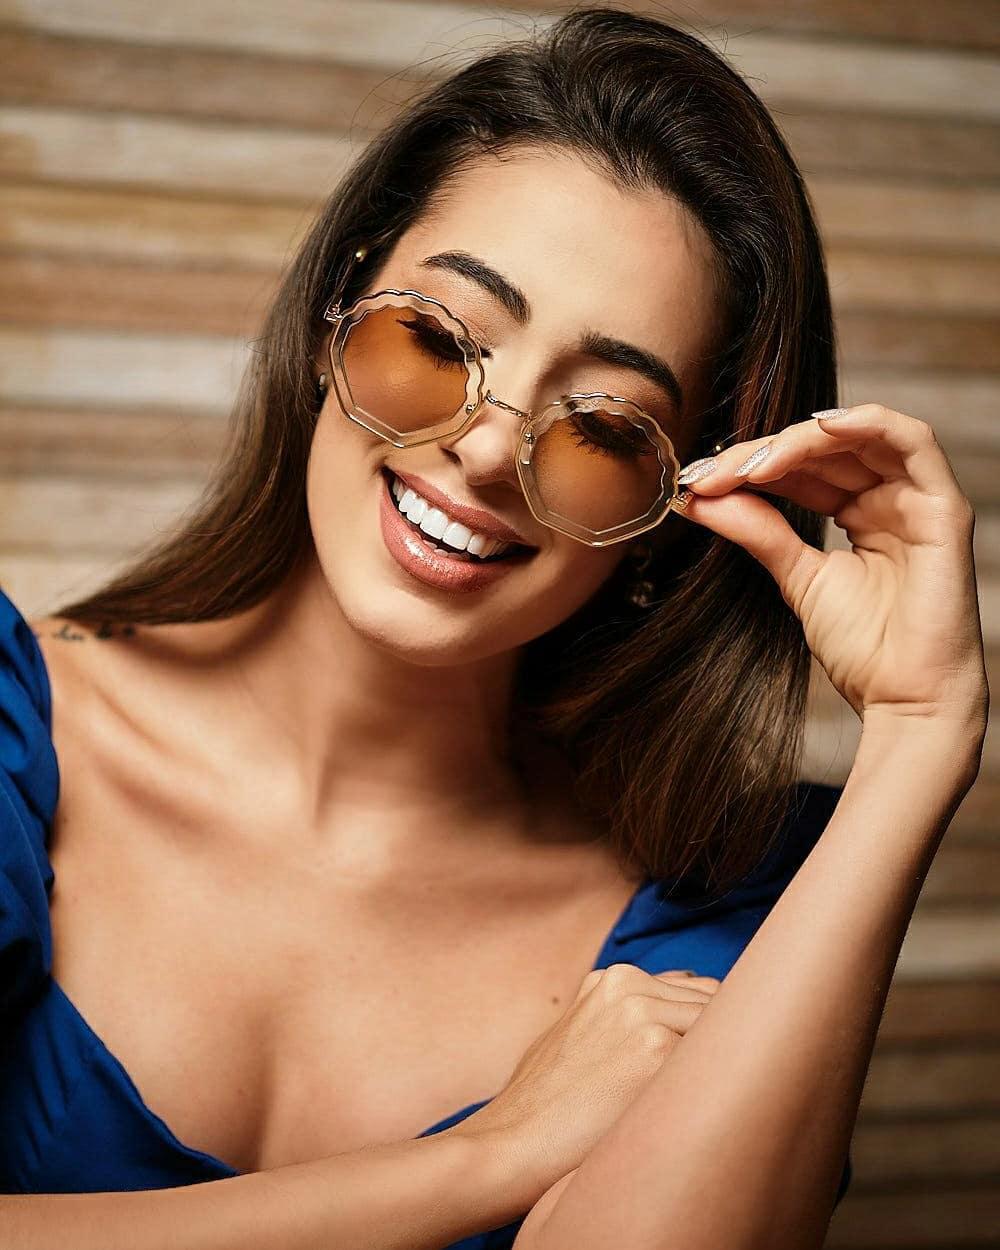 natalia gurgel, top model brasil 2021/miss morada nova 2019/miss sertao central empresarial 2018/top 20 de miss asia pacific international 2018, representando o uruguai. - Página 6 21373418